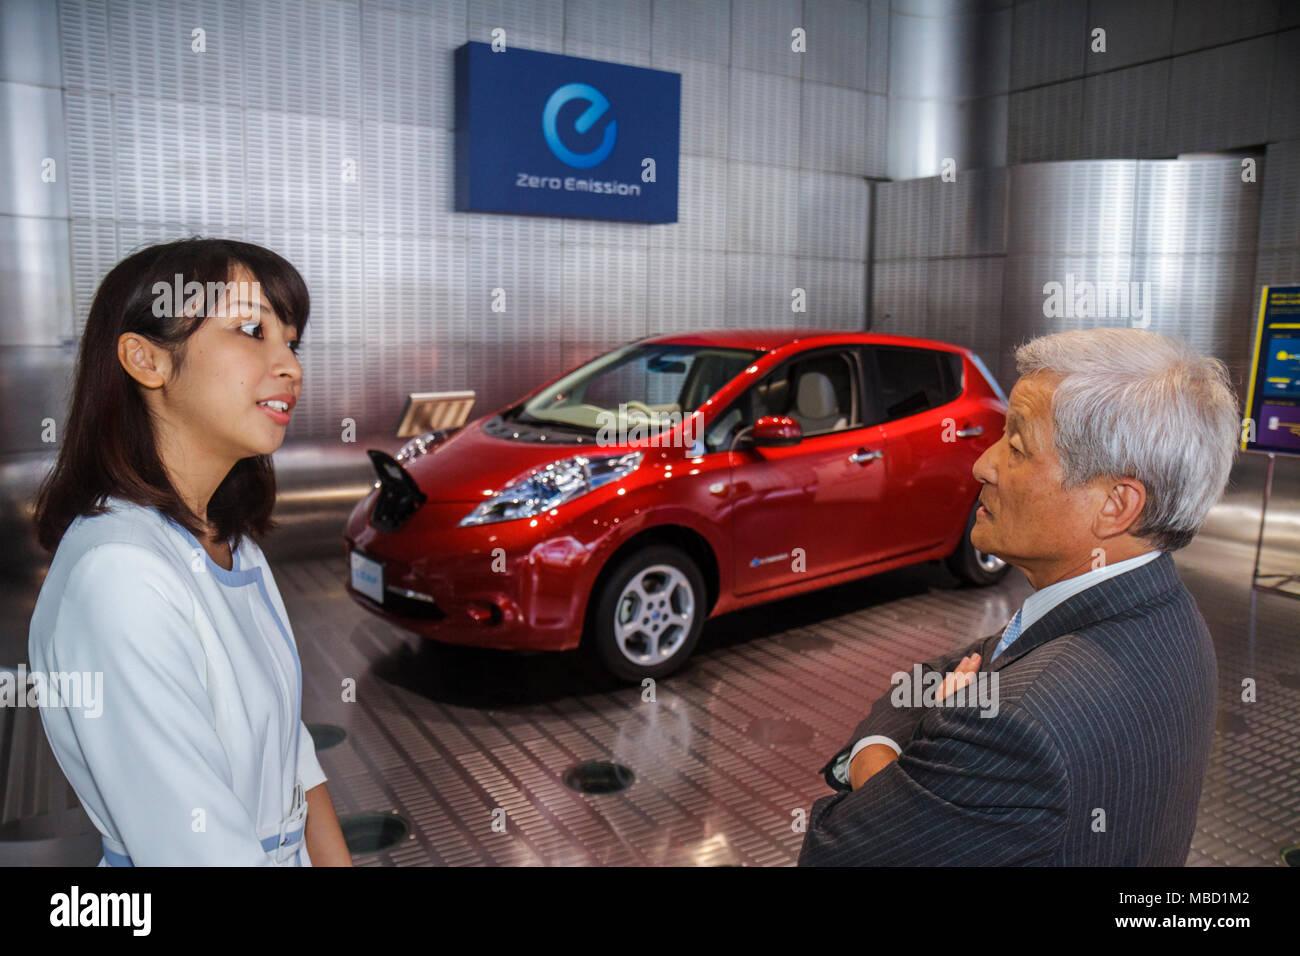 Car Models Stock Photos & Car Models Stock Images - Alamy